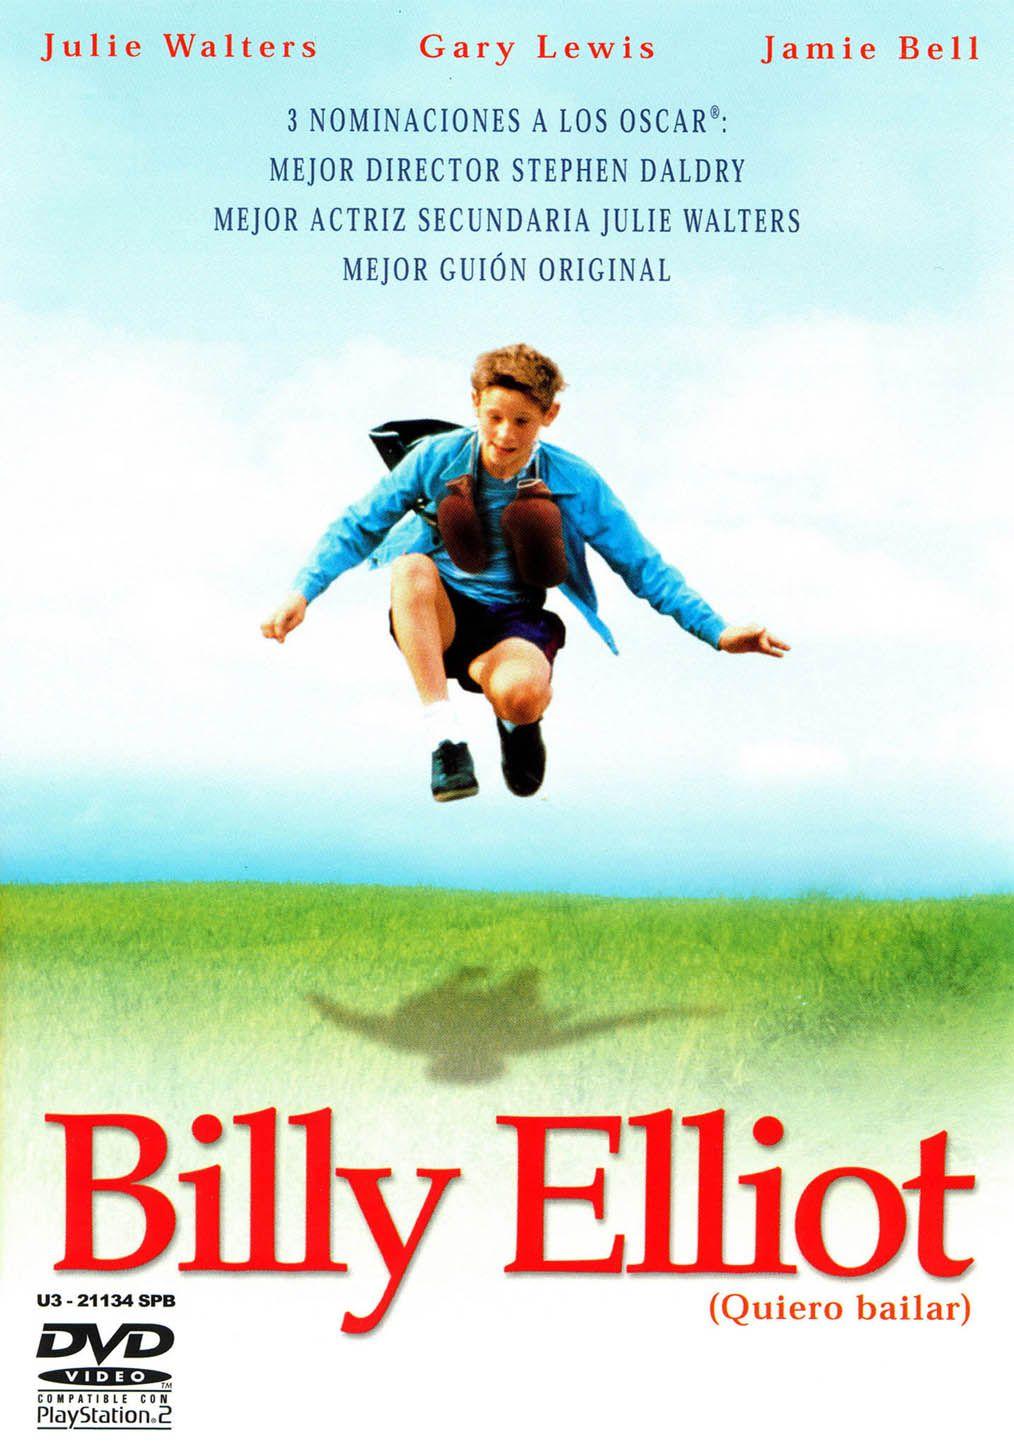 Billy Elliot Billy Elliot Peliculas De Drama Afiche De Pelicula